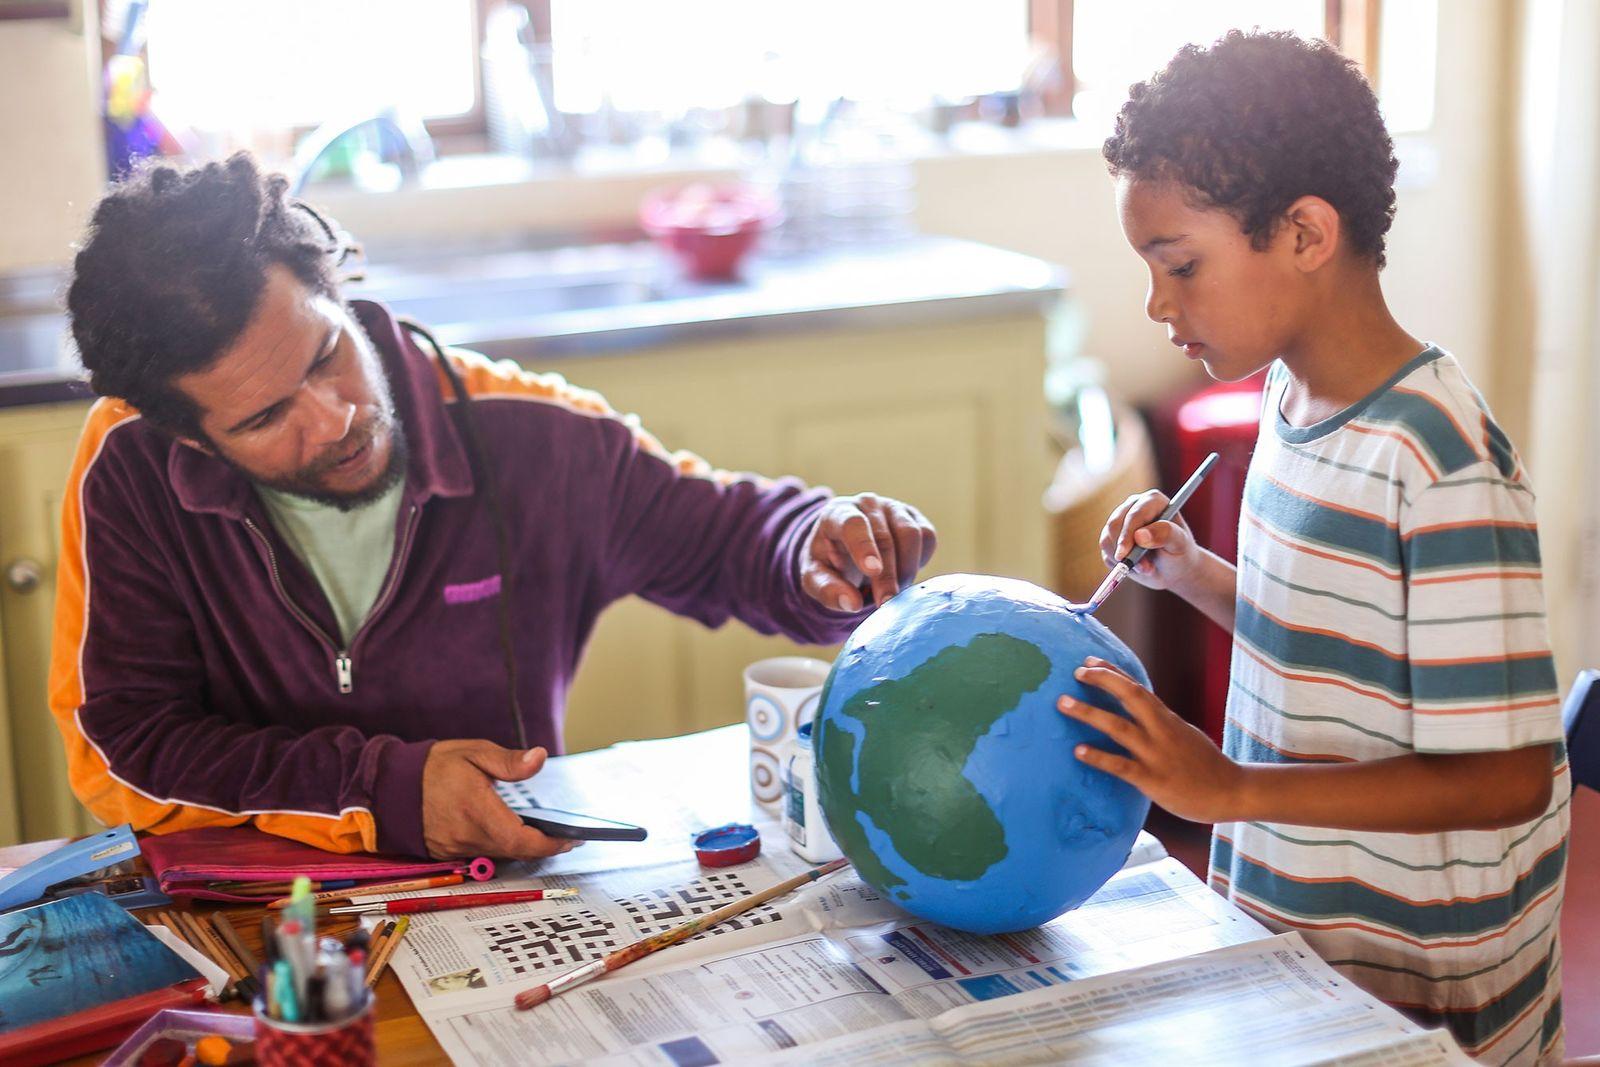 Ideas for kid-focused activities during coronavirus shutdowns